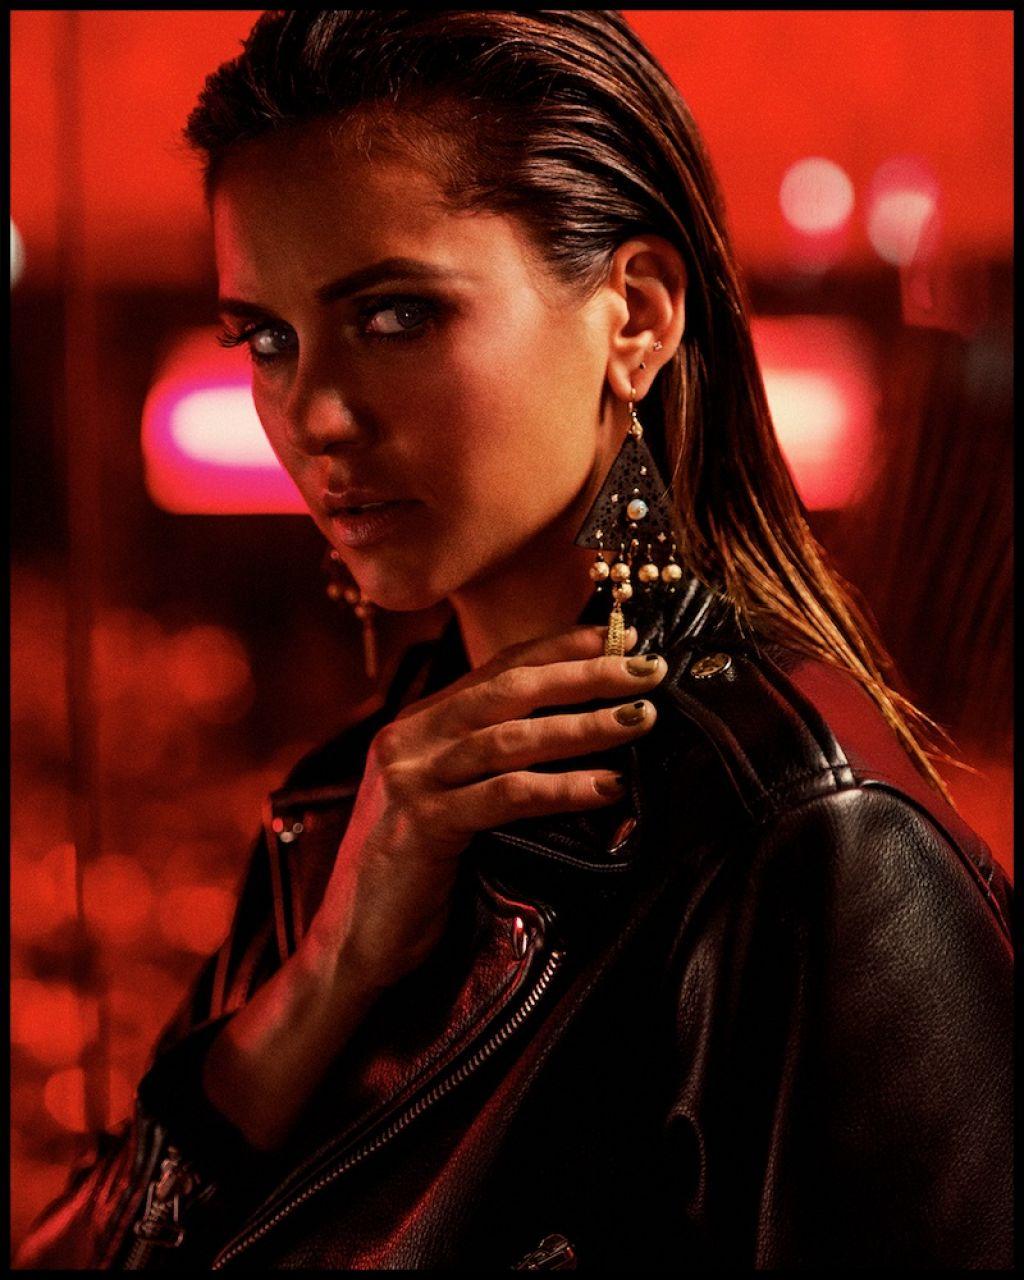 nina dobrev photoshoot for interview mag november 2015